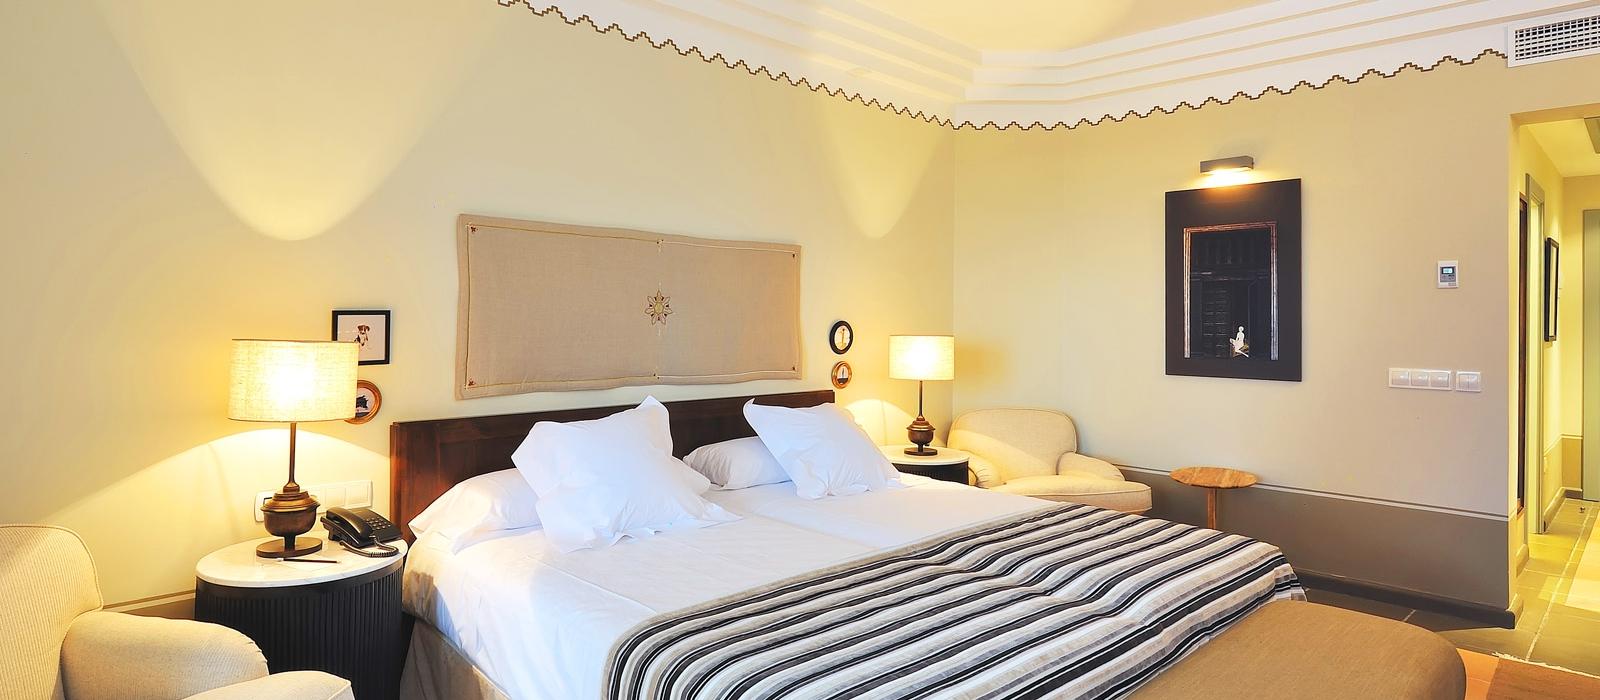 Offers Hotels Vincci Estrella del Mar - Prenota ora e risparmia! -10%